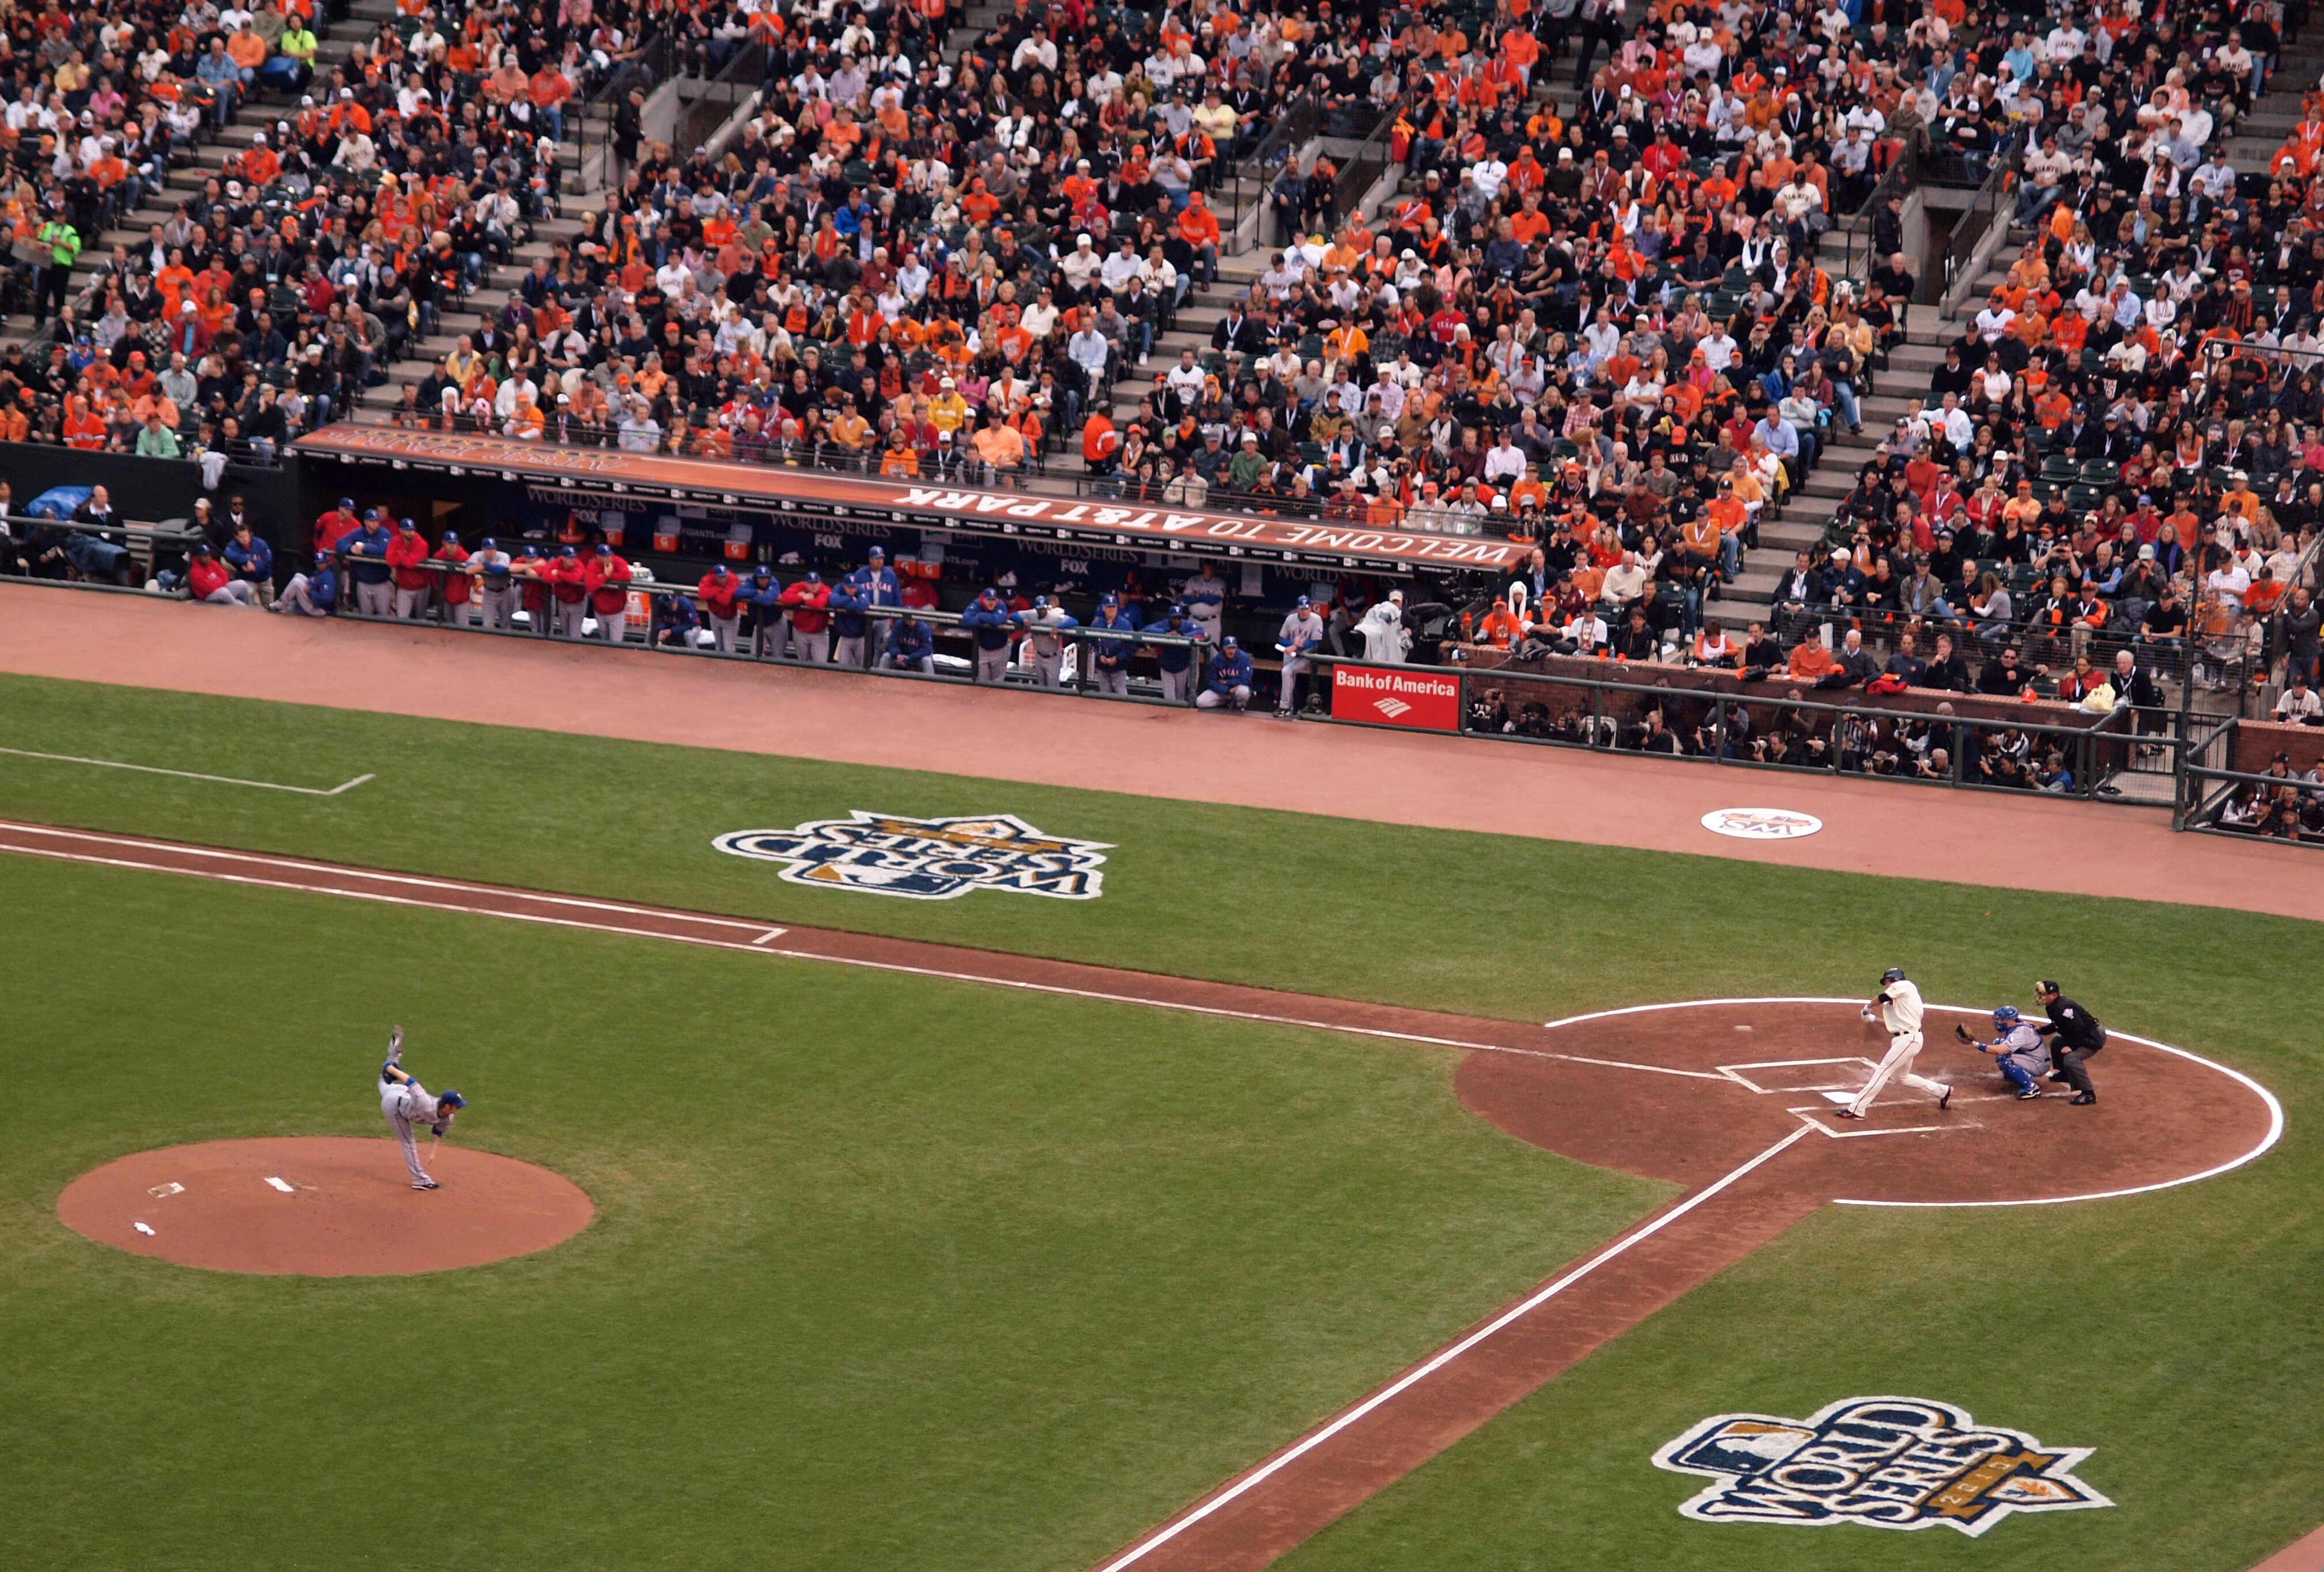 2019 World Series Odds Tracker | SBD